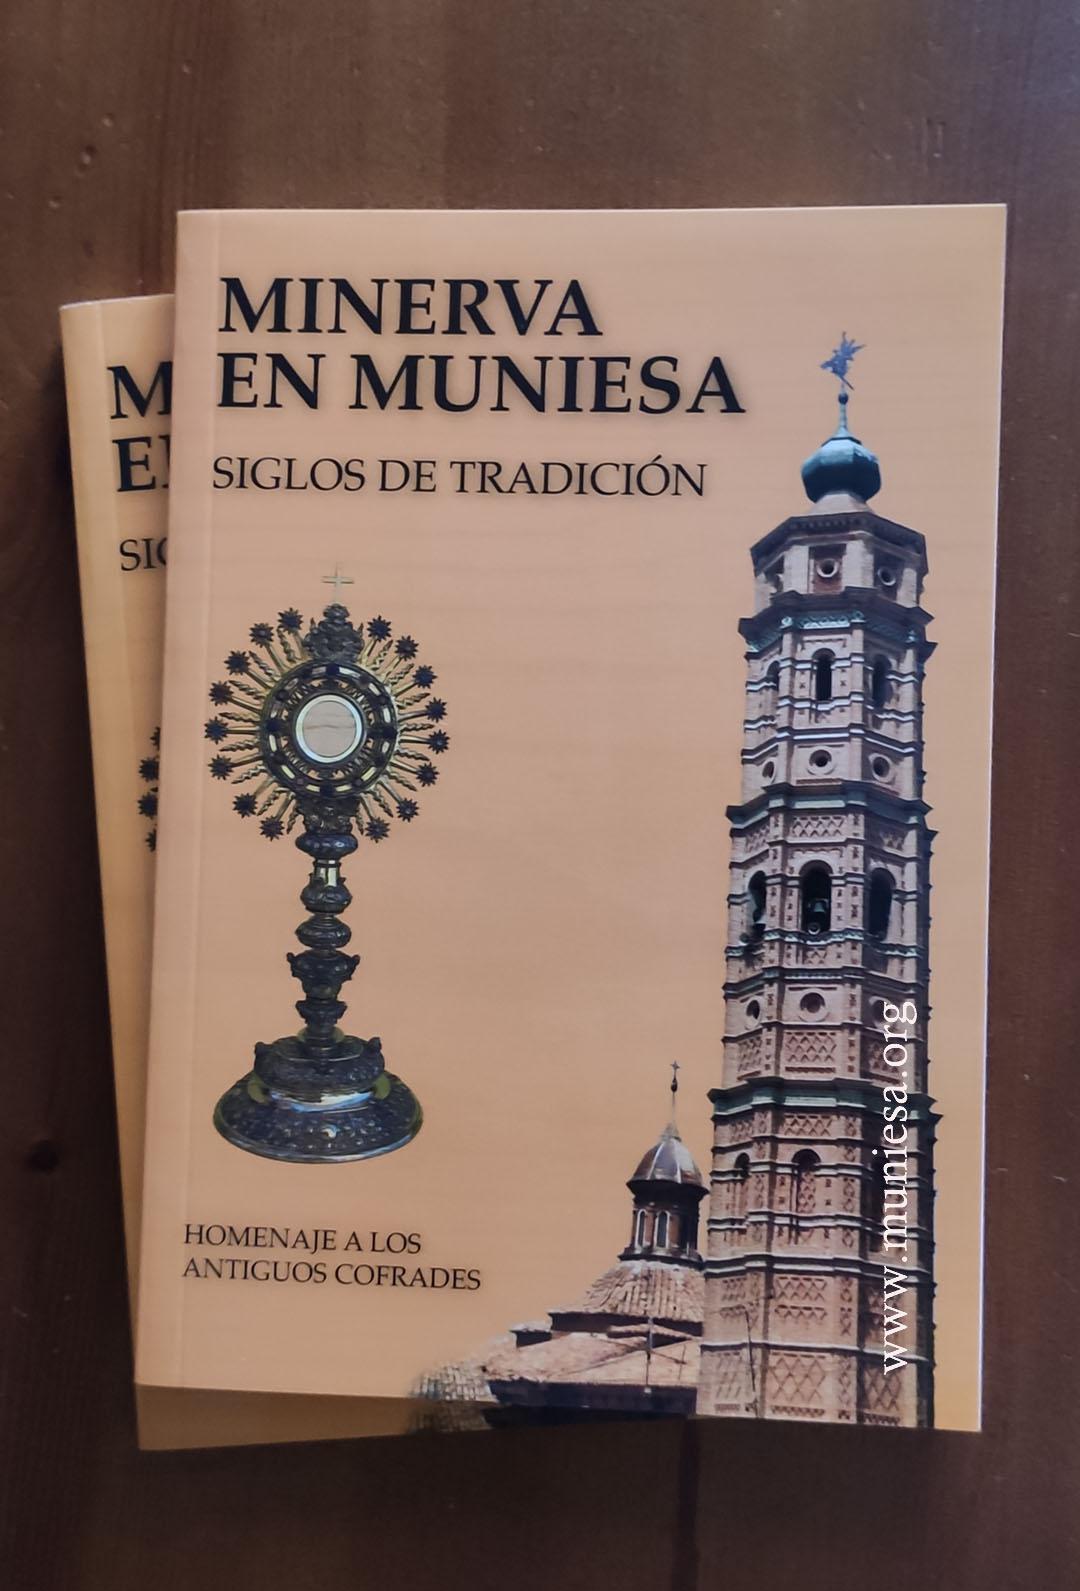 EL CORPUS EN MUNIESA. LA MINERVA